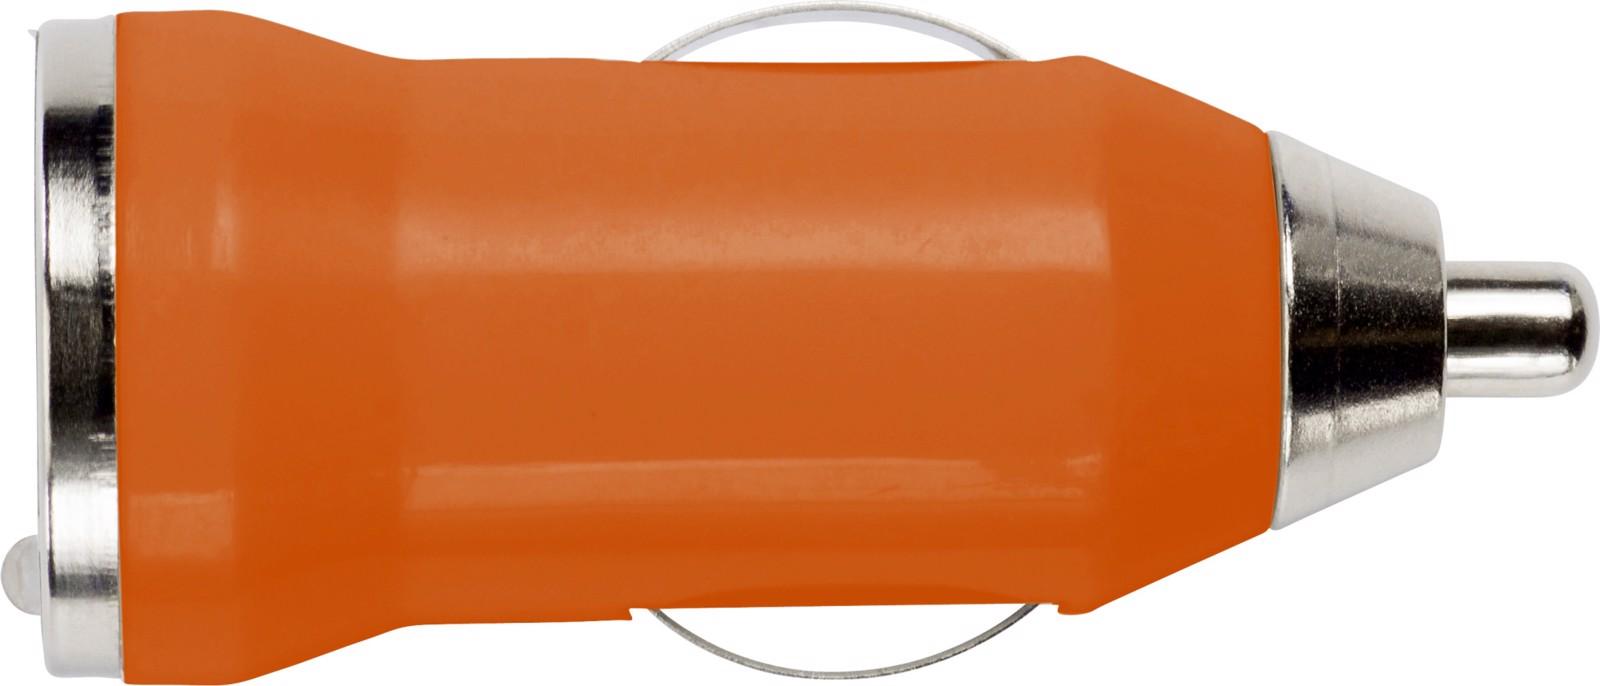 ABS car power adapter - Orange